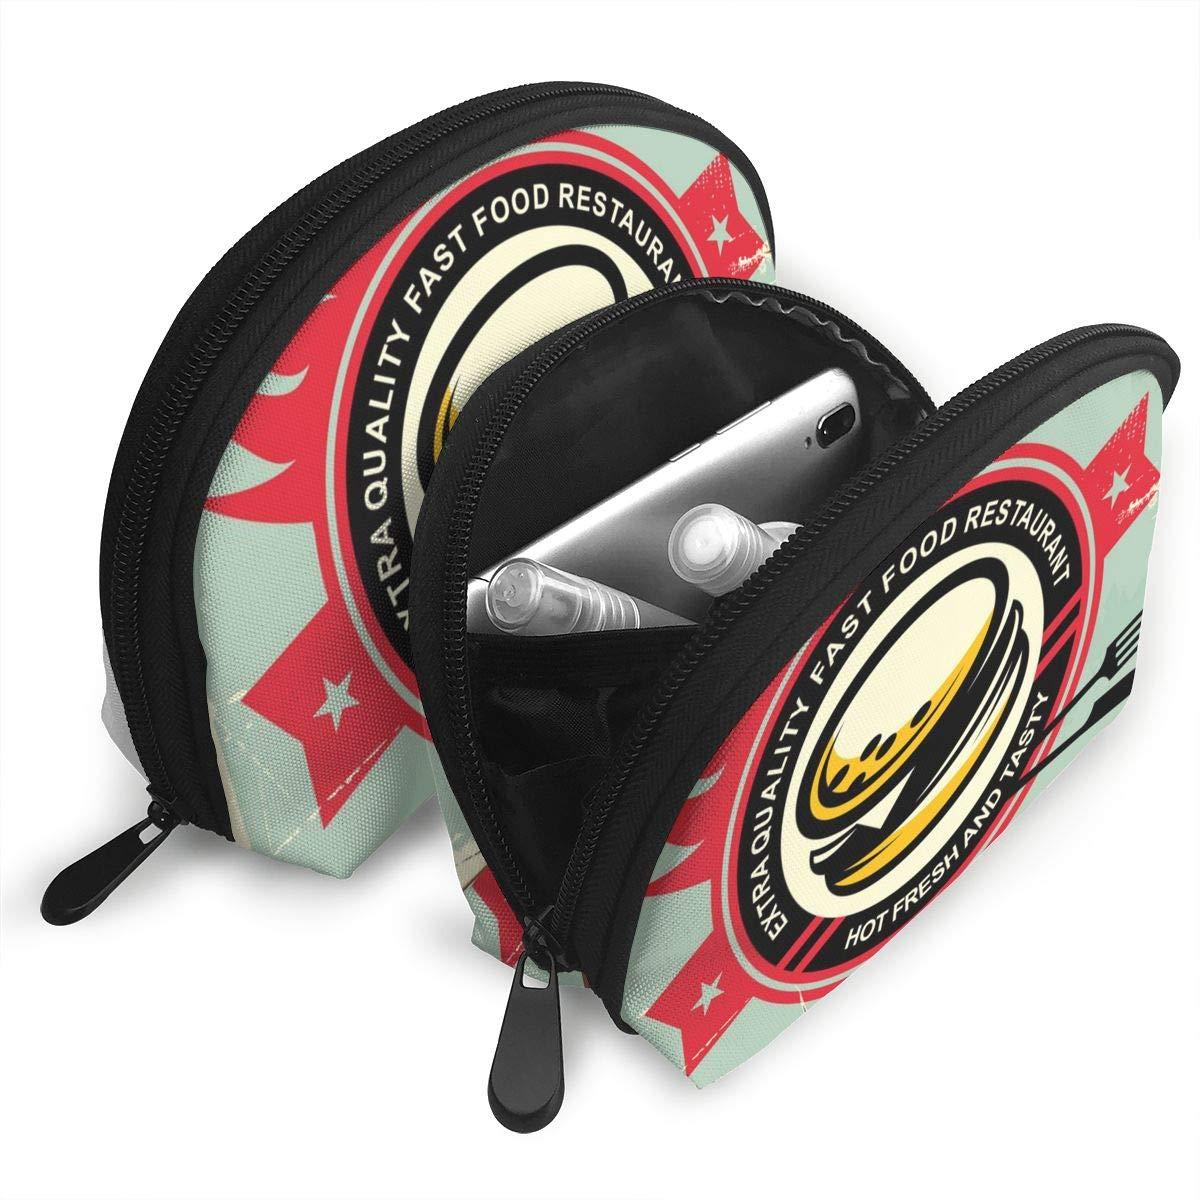 Amazon.com: Zimubbic Burgers - Bolsa de cosméticos portátil ...